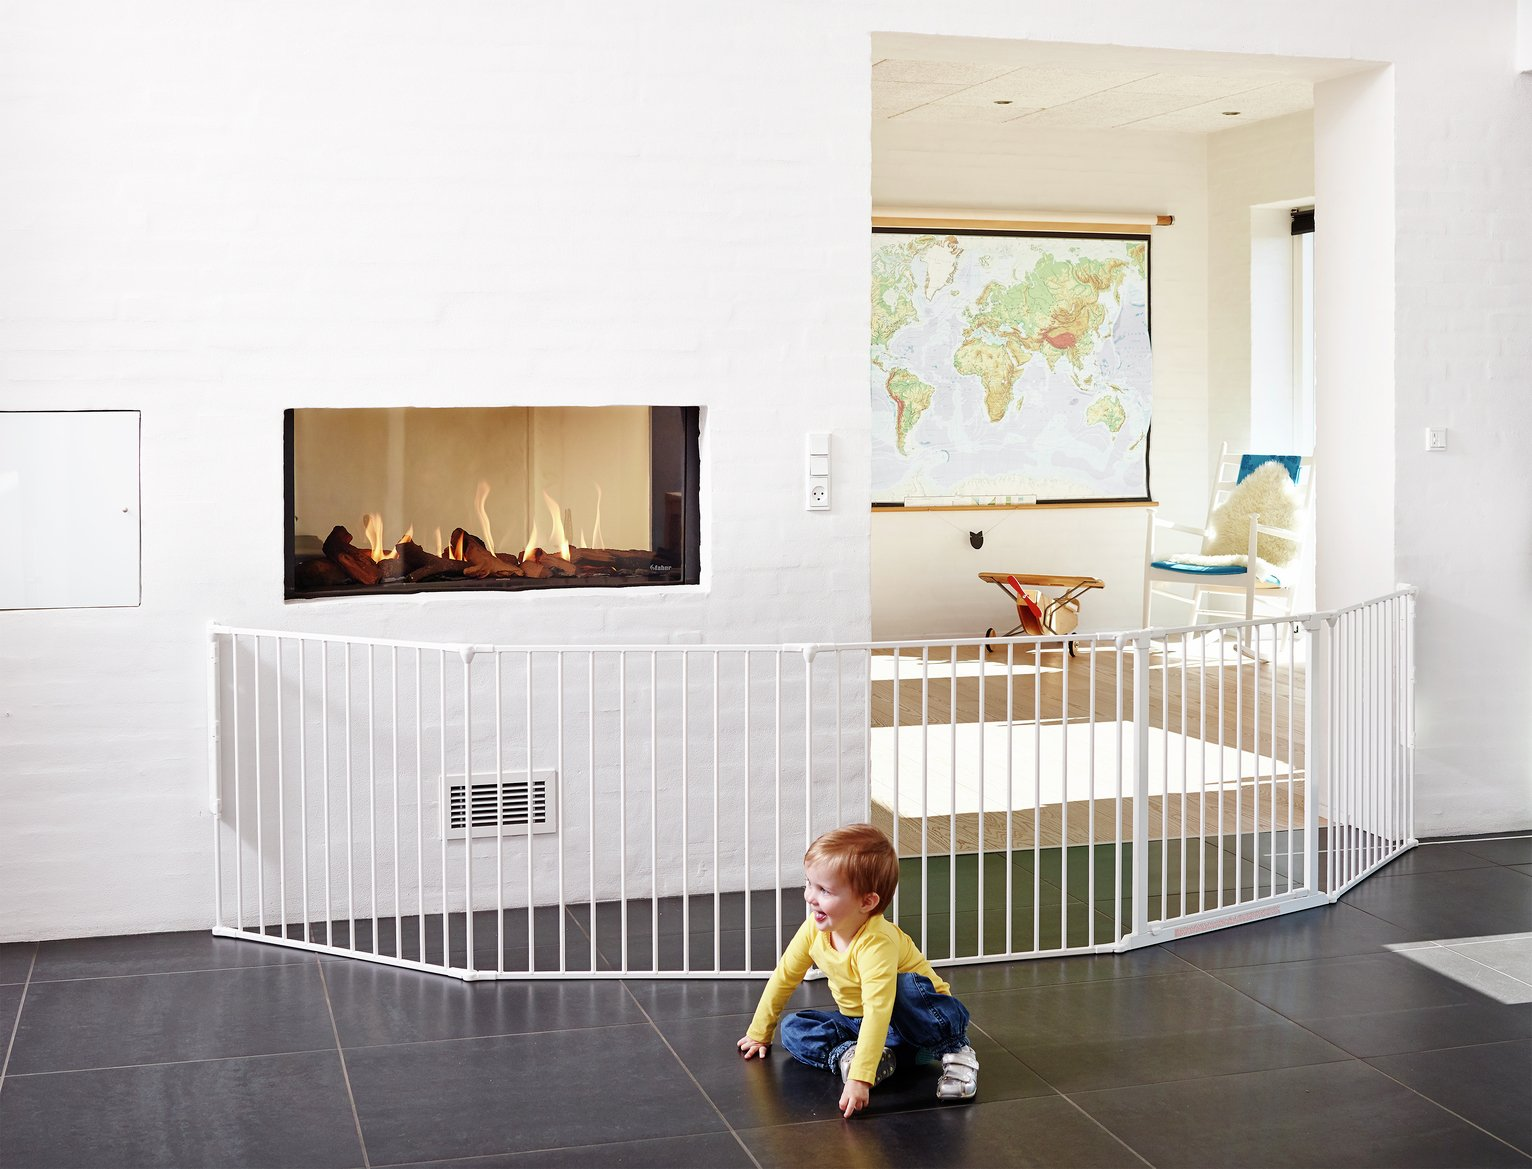 Buy BabyDan XXL Room Gate Divider White Playpens Argos